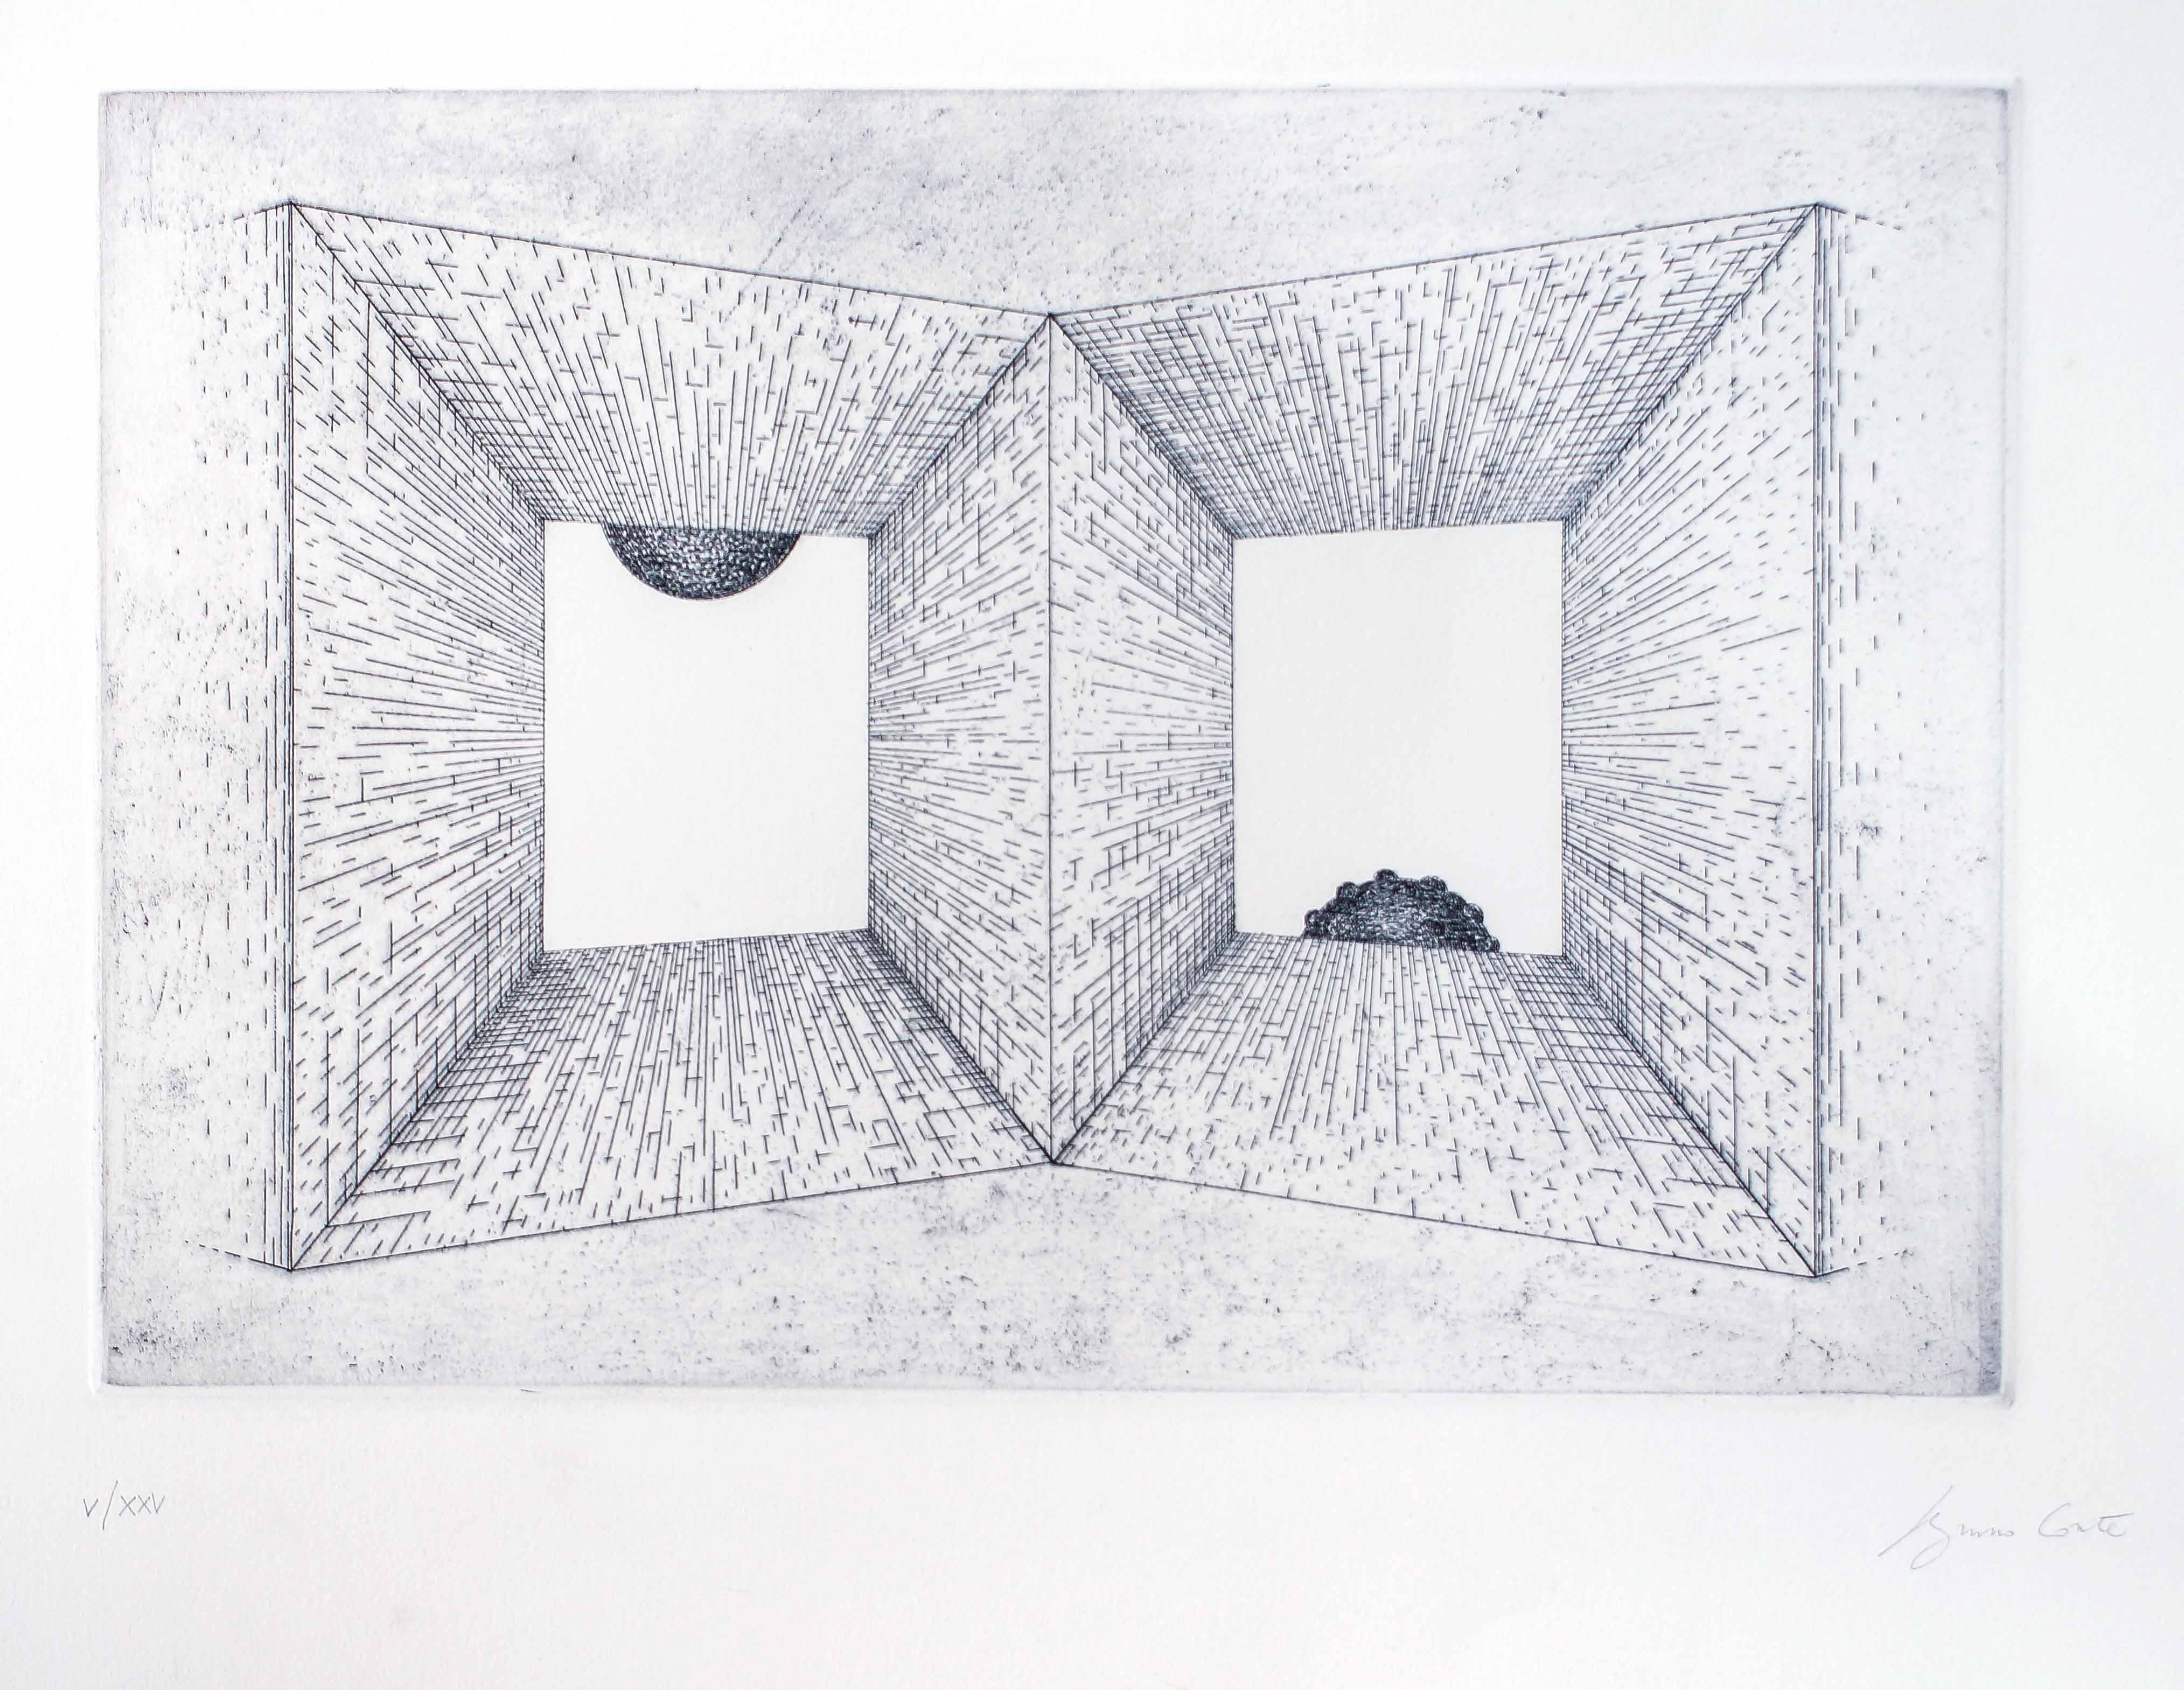 Perspective - Original Etching by Bruno Conte - 1980 ca.